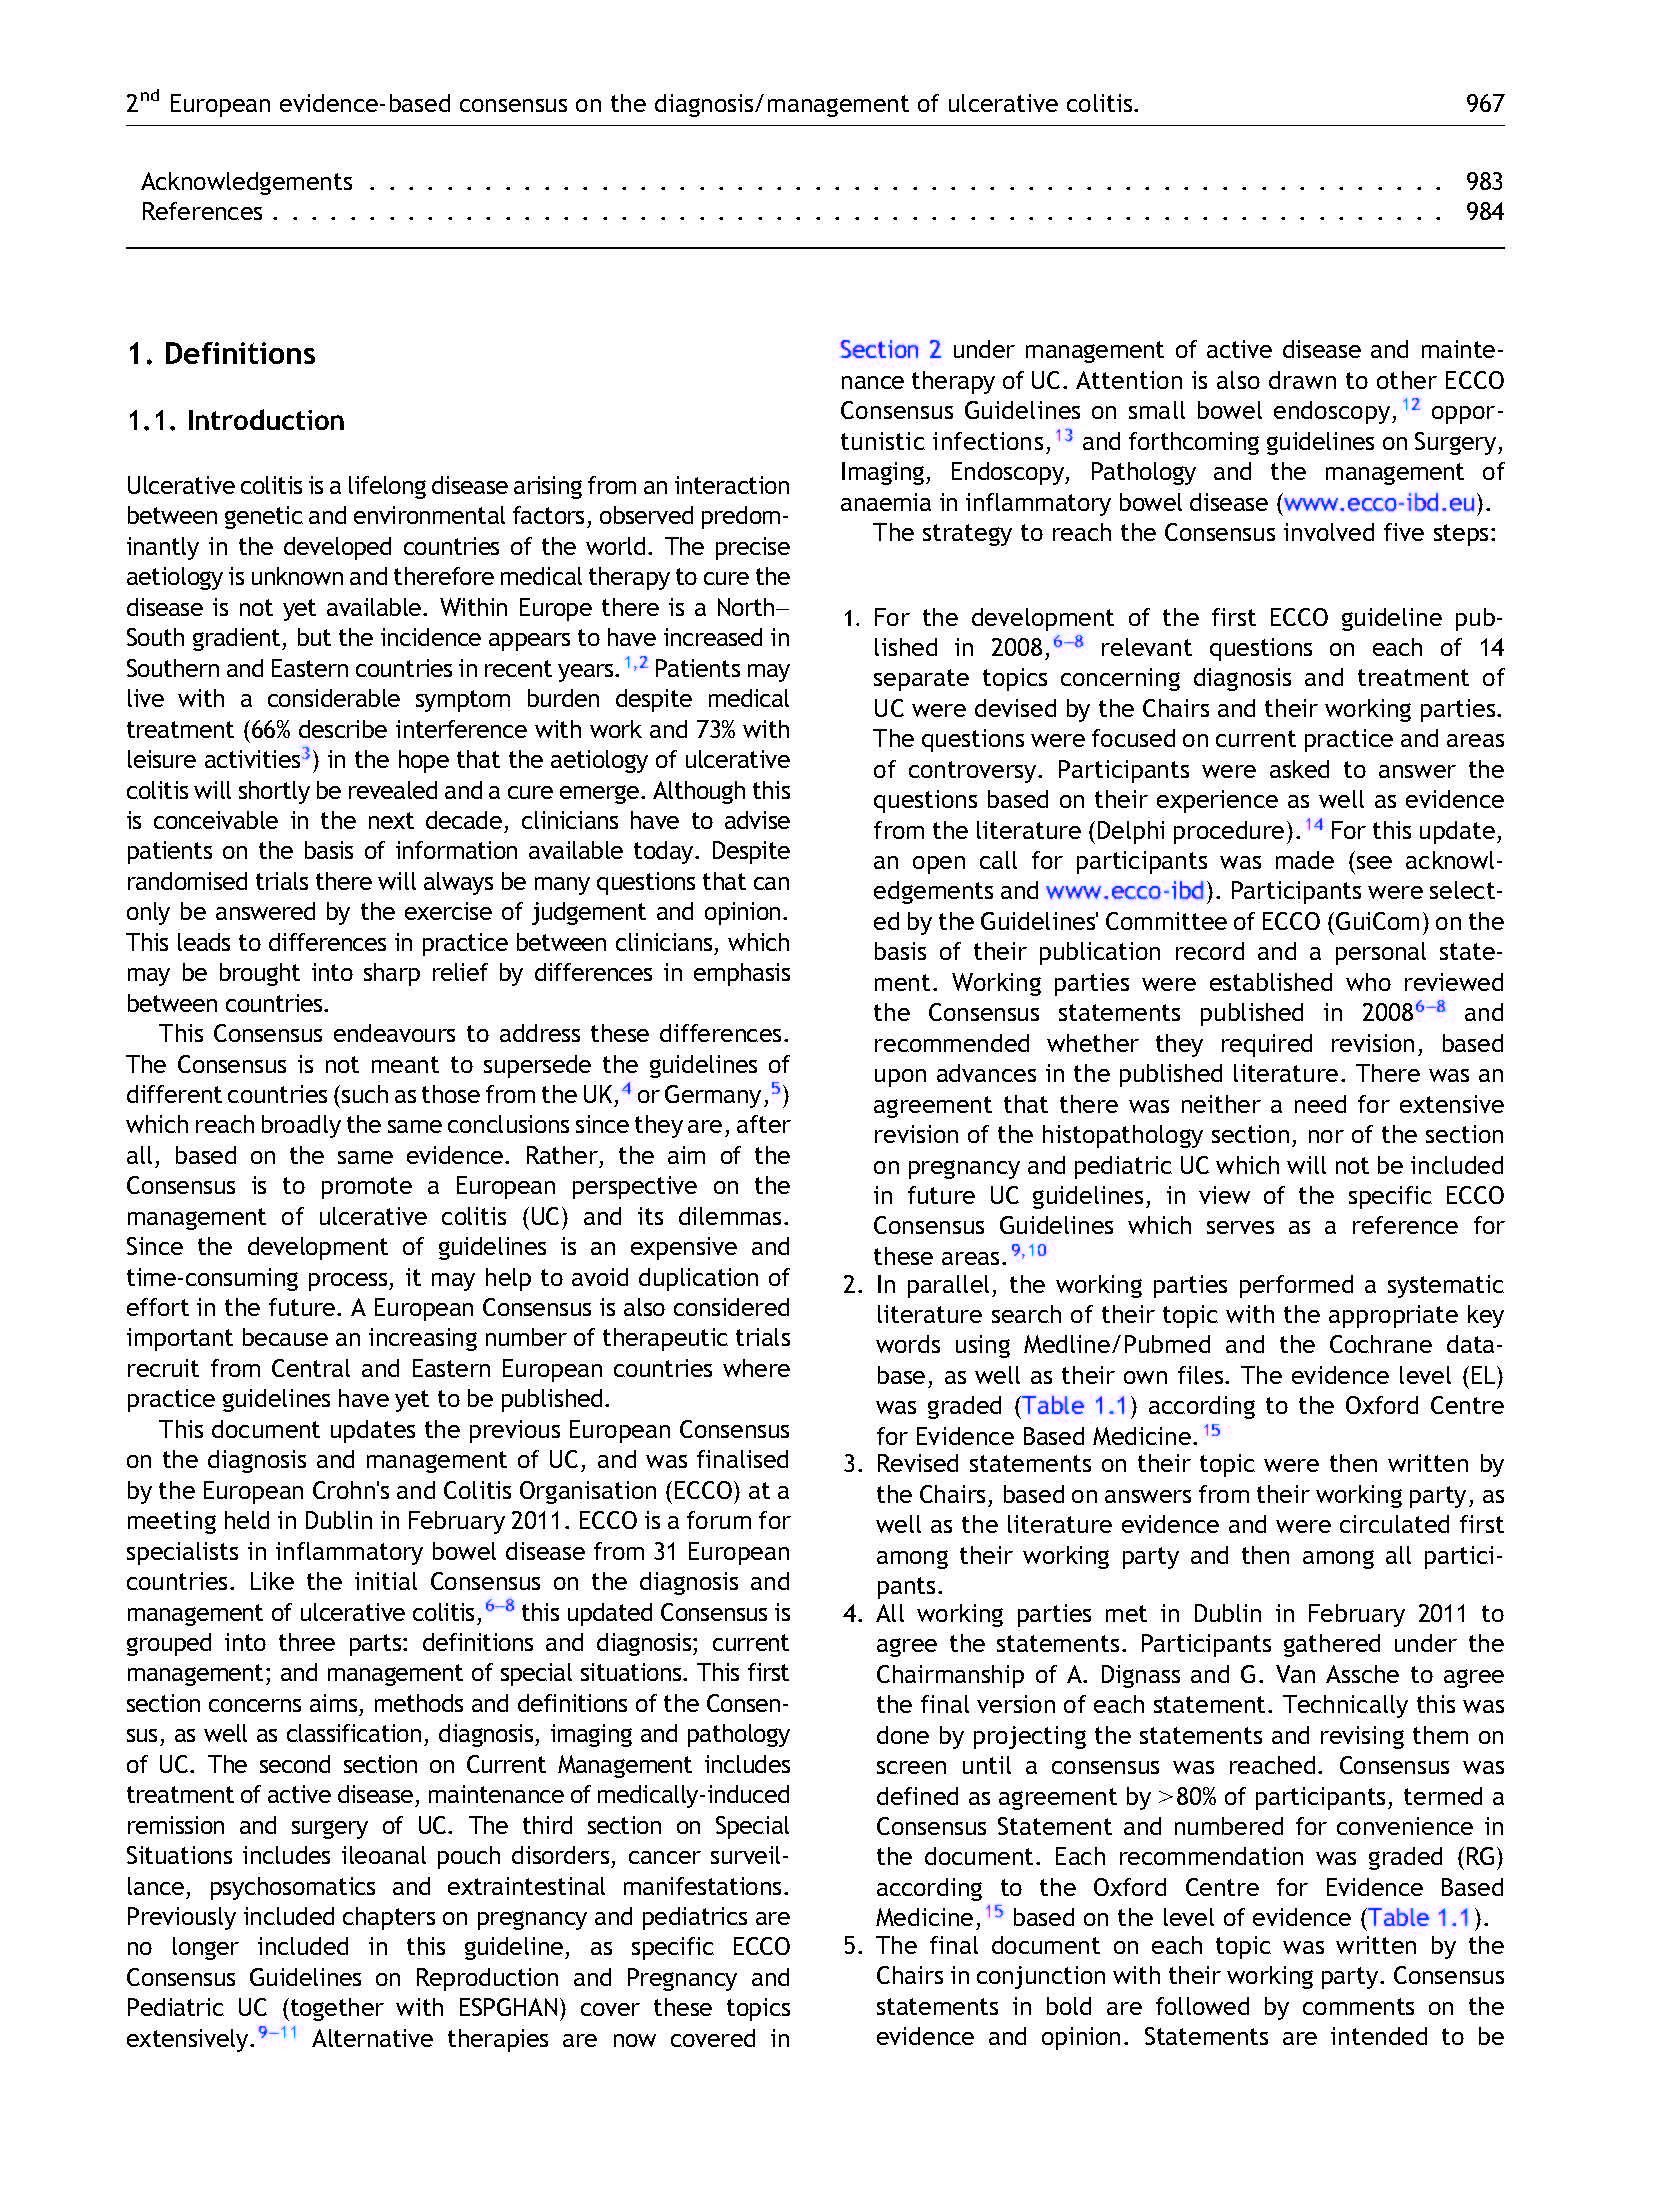 2012-ECCO第二版-欧洲询证共识:溃疡性结肠炎的诊断和处理—定义与诊断_页面_03.jpg